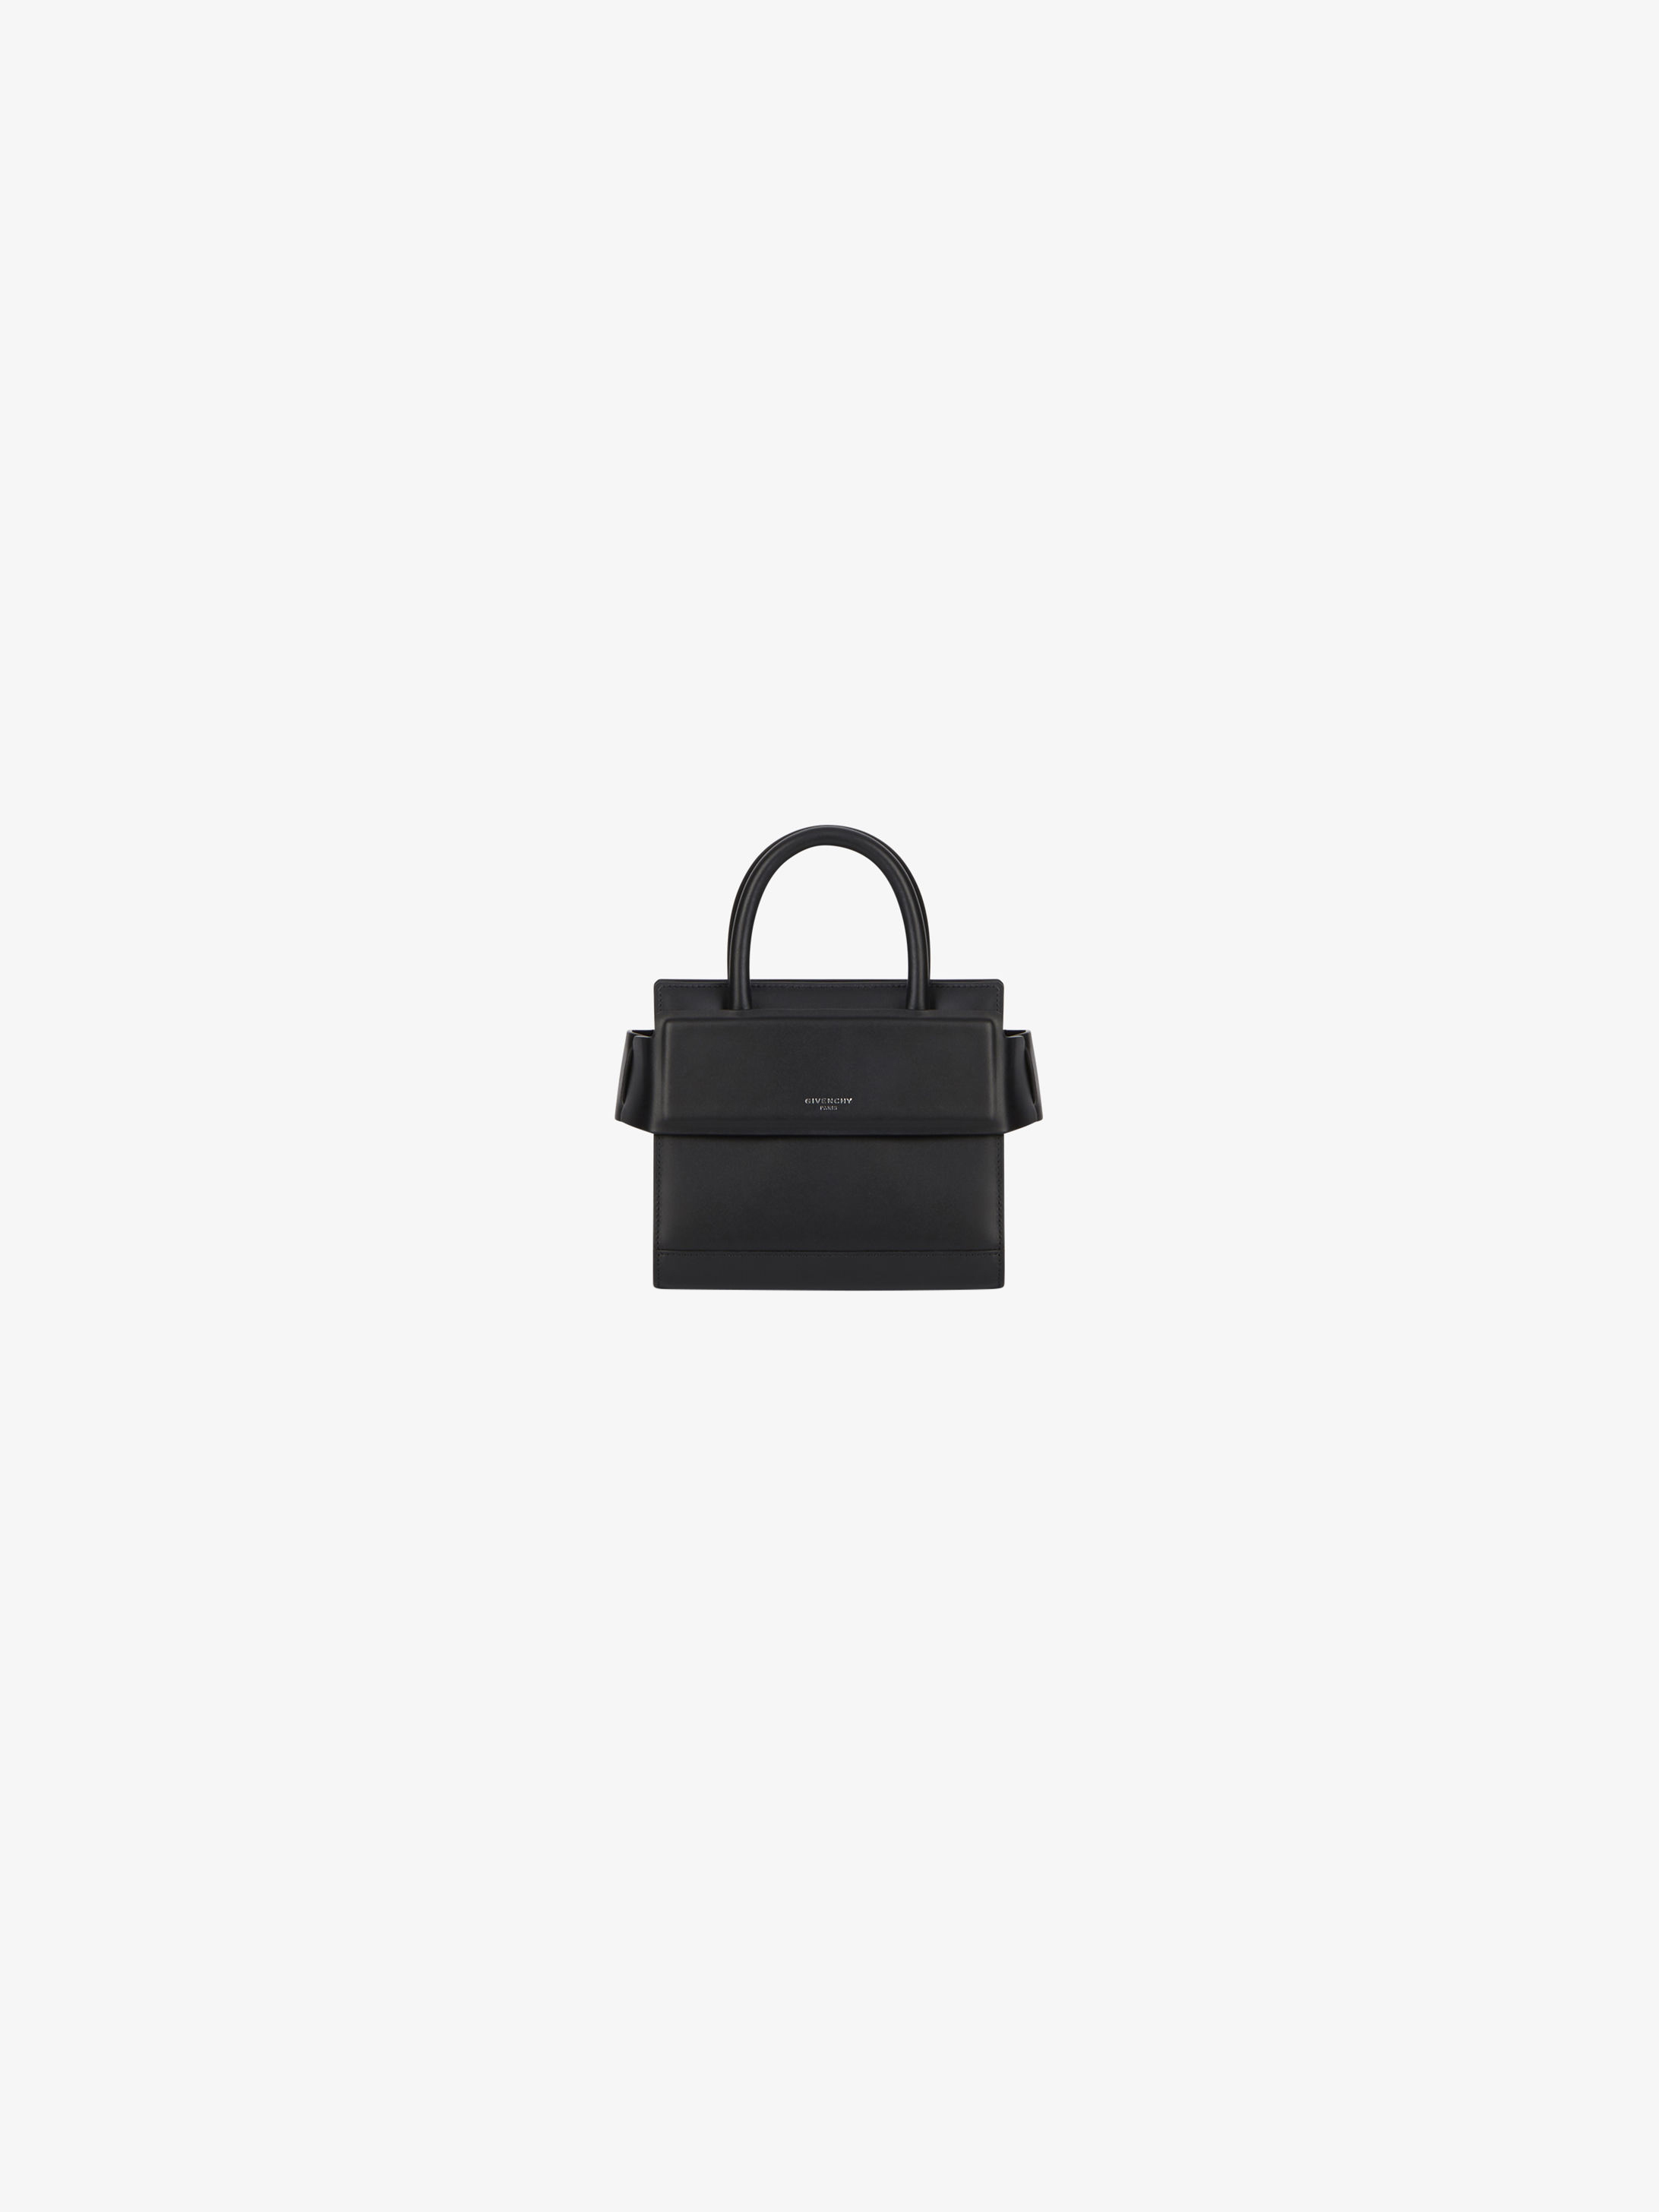 Nano Horizon bag in matte smooth leather